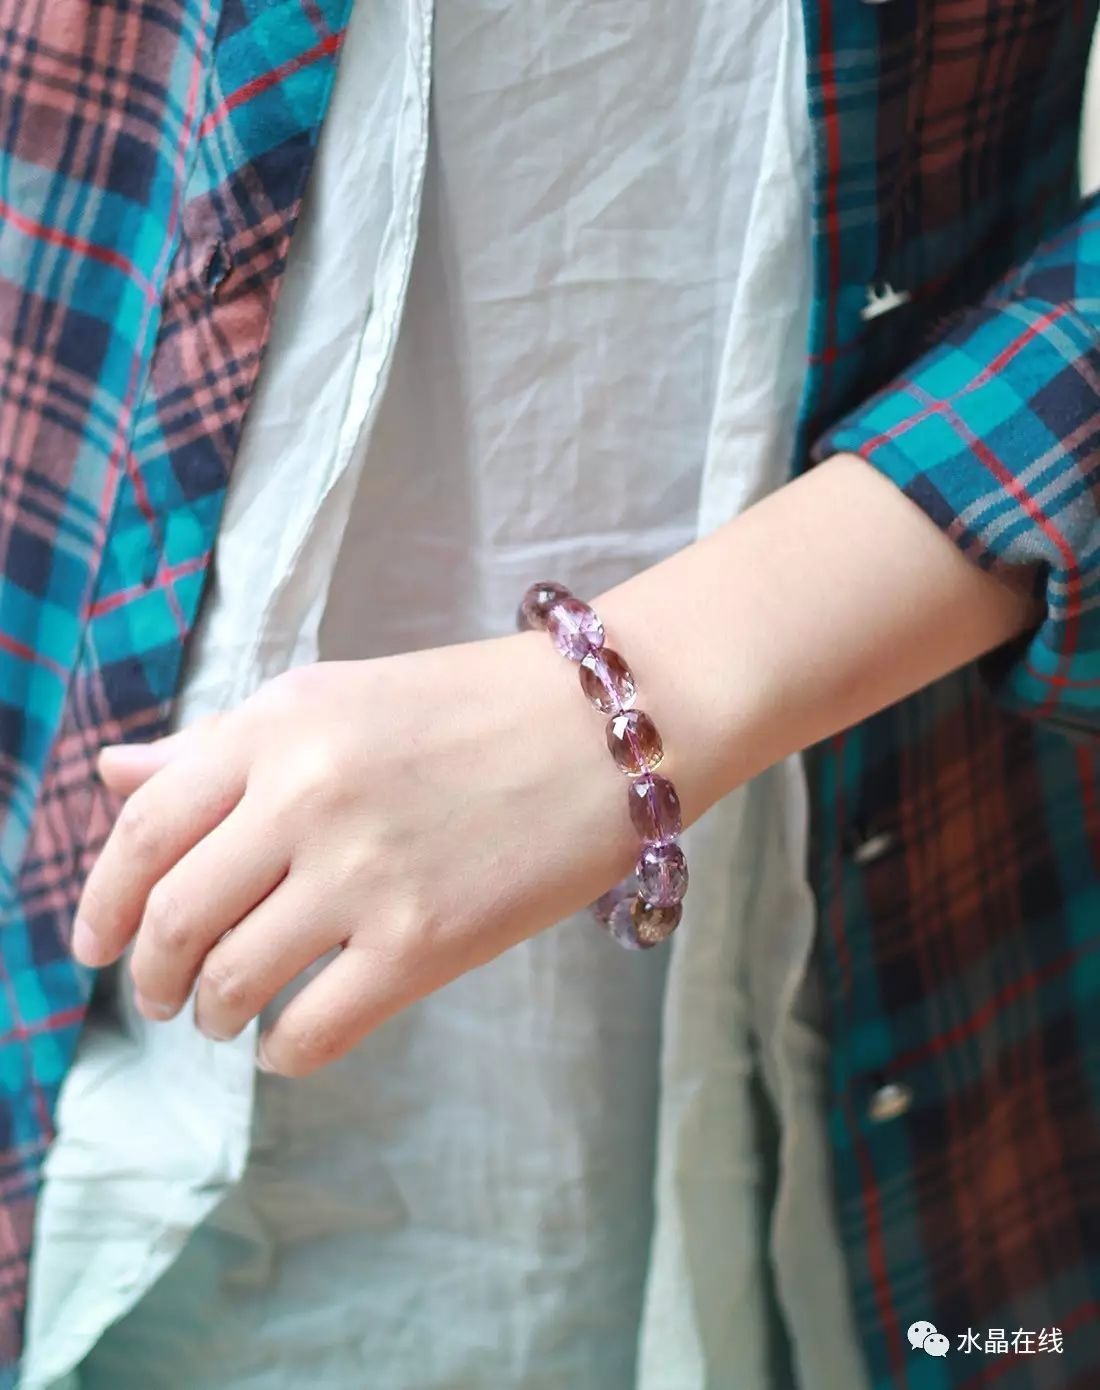 resize,m fill,h 1390,w 1100 - 每一个女人都应该有自己的一条水晶手链!